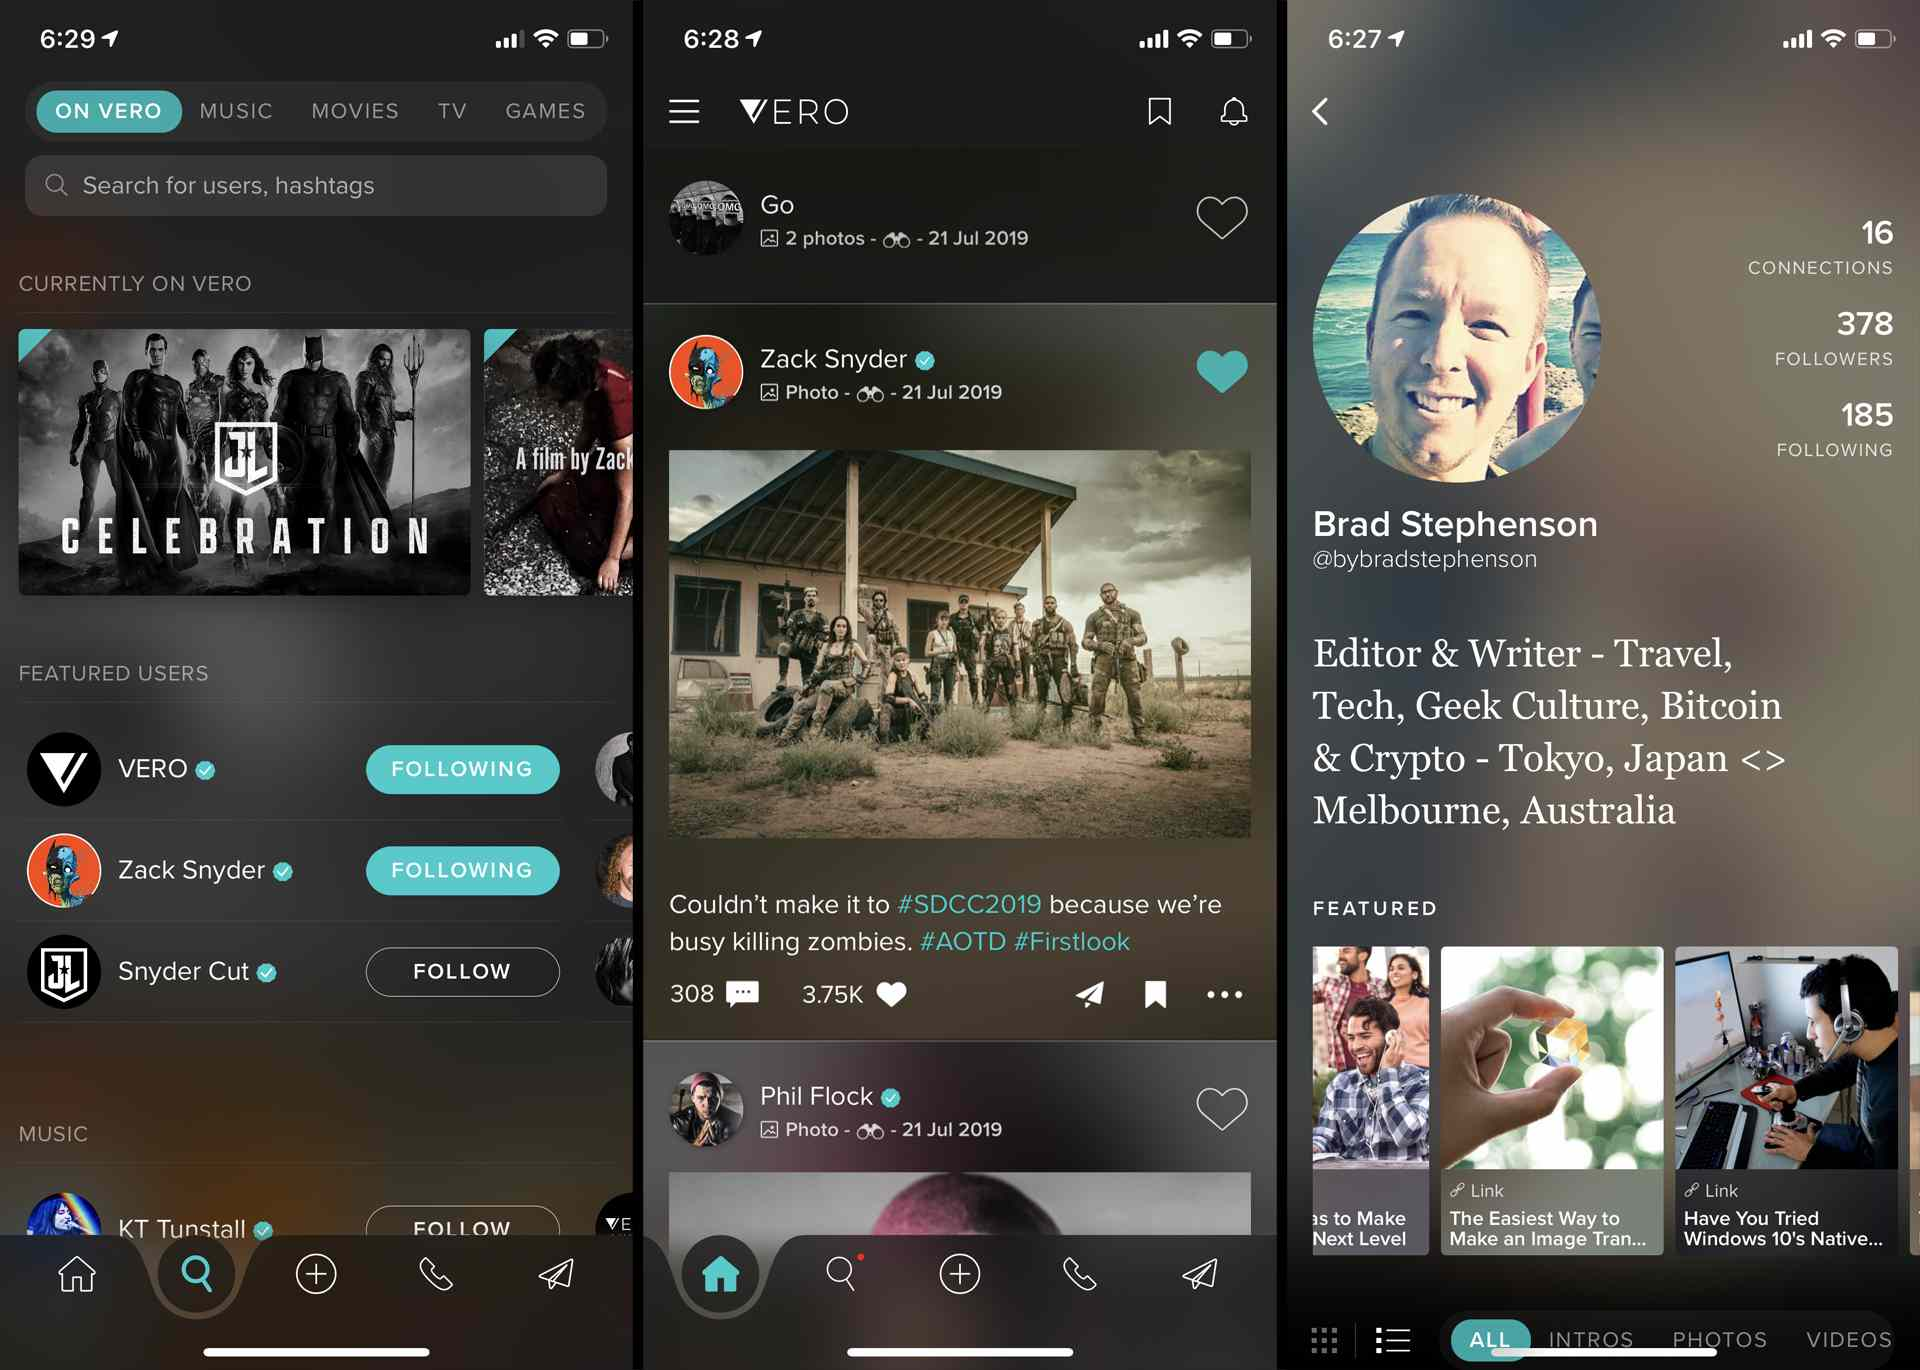 Vero social media app on iPhone.